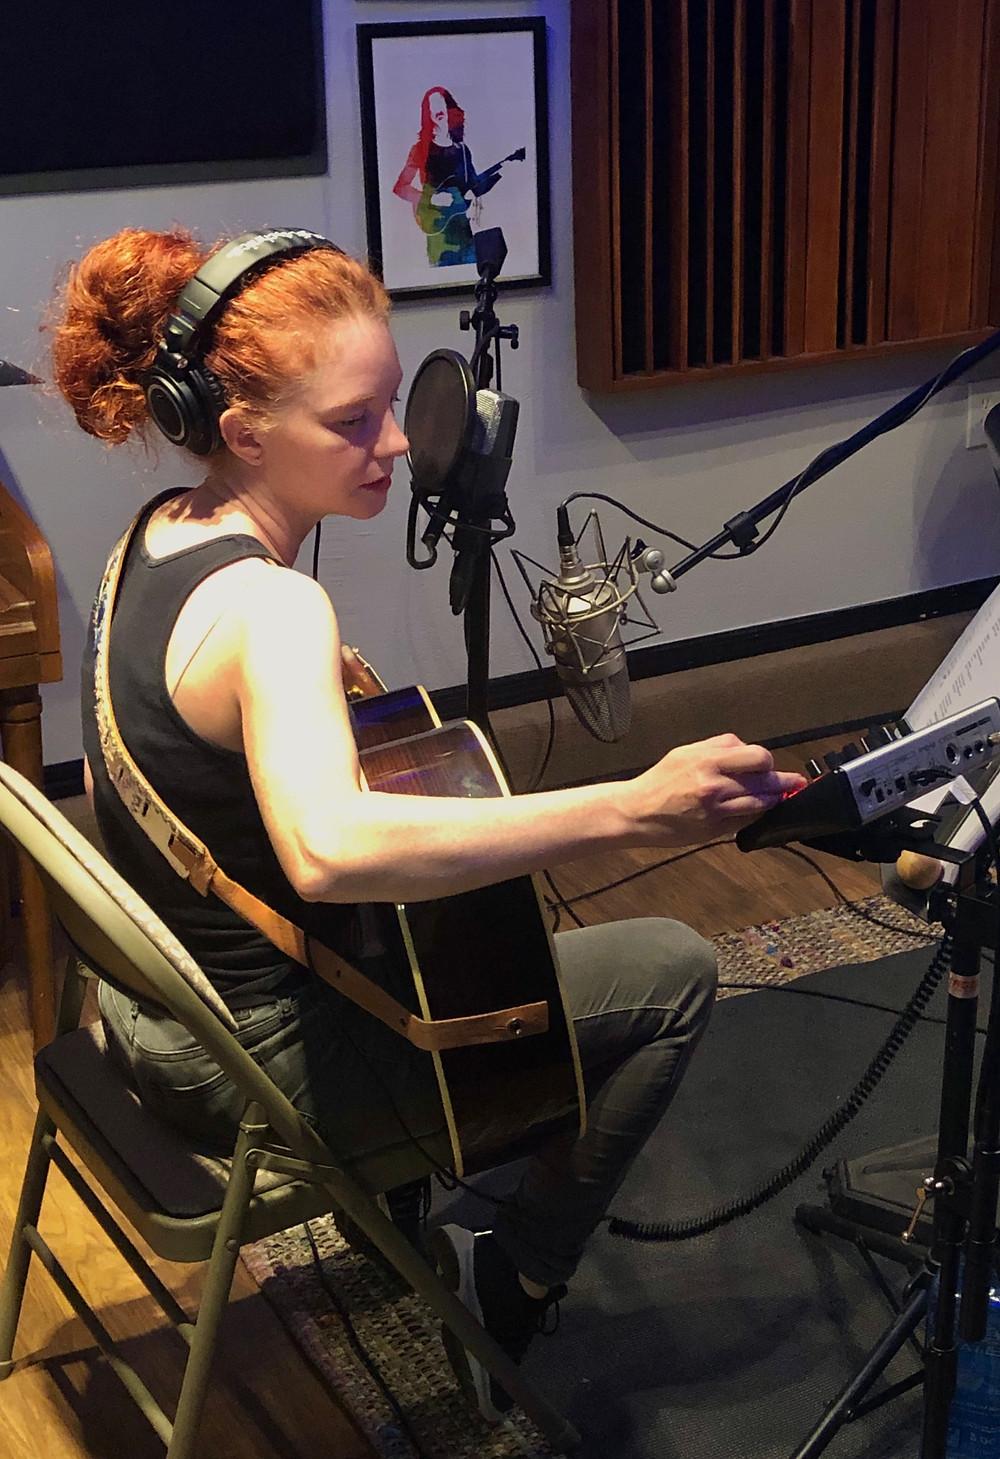 Amanda Colleen Williams Nashville red headed songwriter in the studio recording new album music